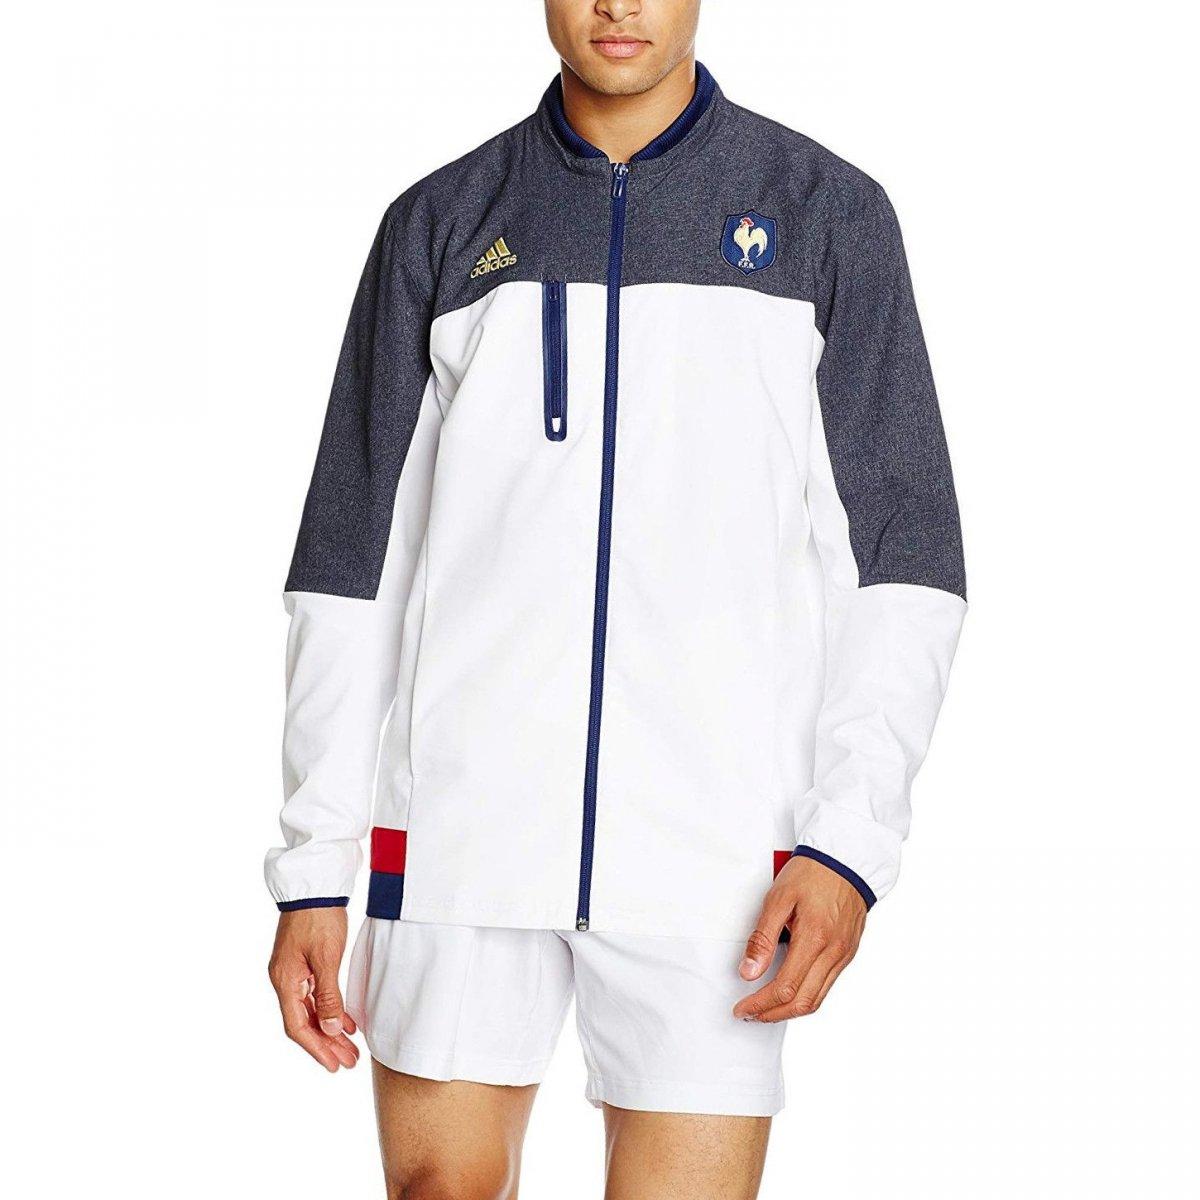 Adidas Francja France bluza reprezentacji męska L